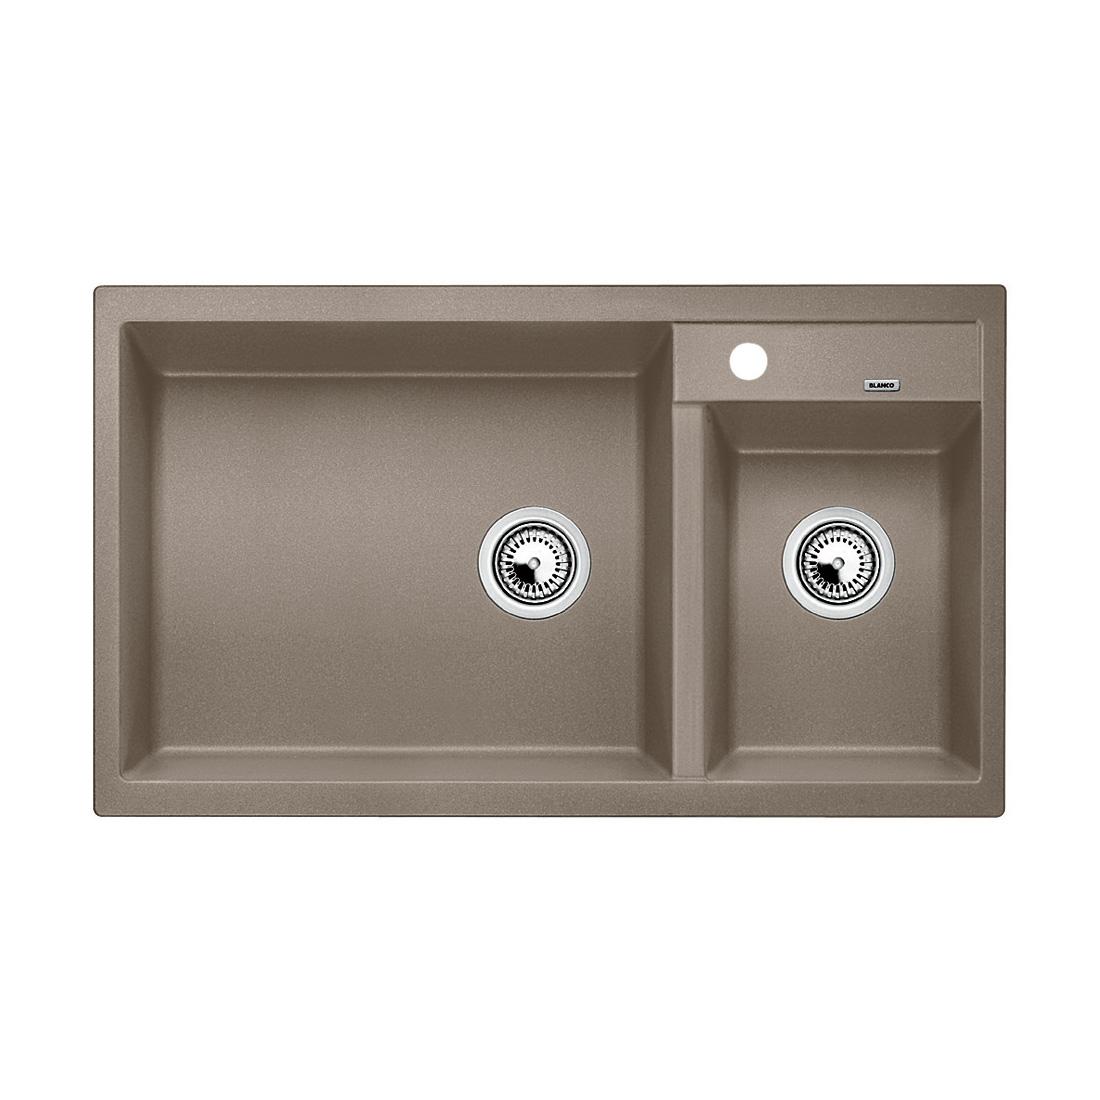 blanco metra 9 sp le b 86 t 50 cm becken silgranit. Black Bedroom Furniture Sets. Home Design Ideas